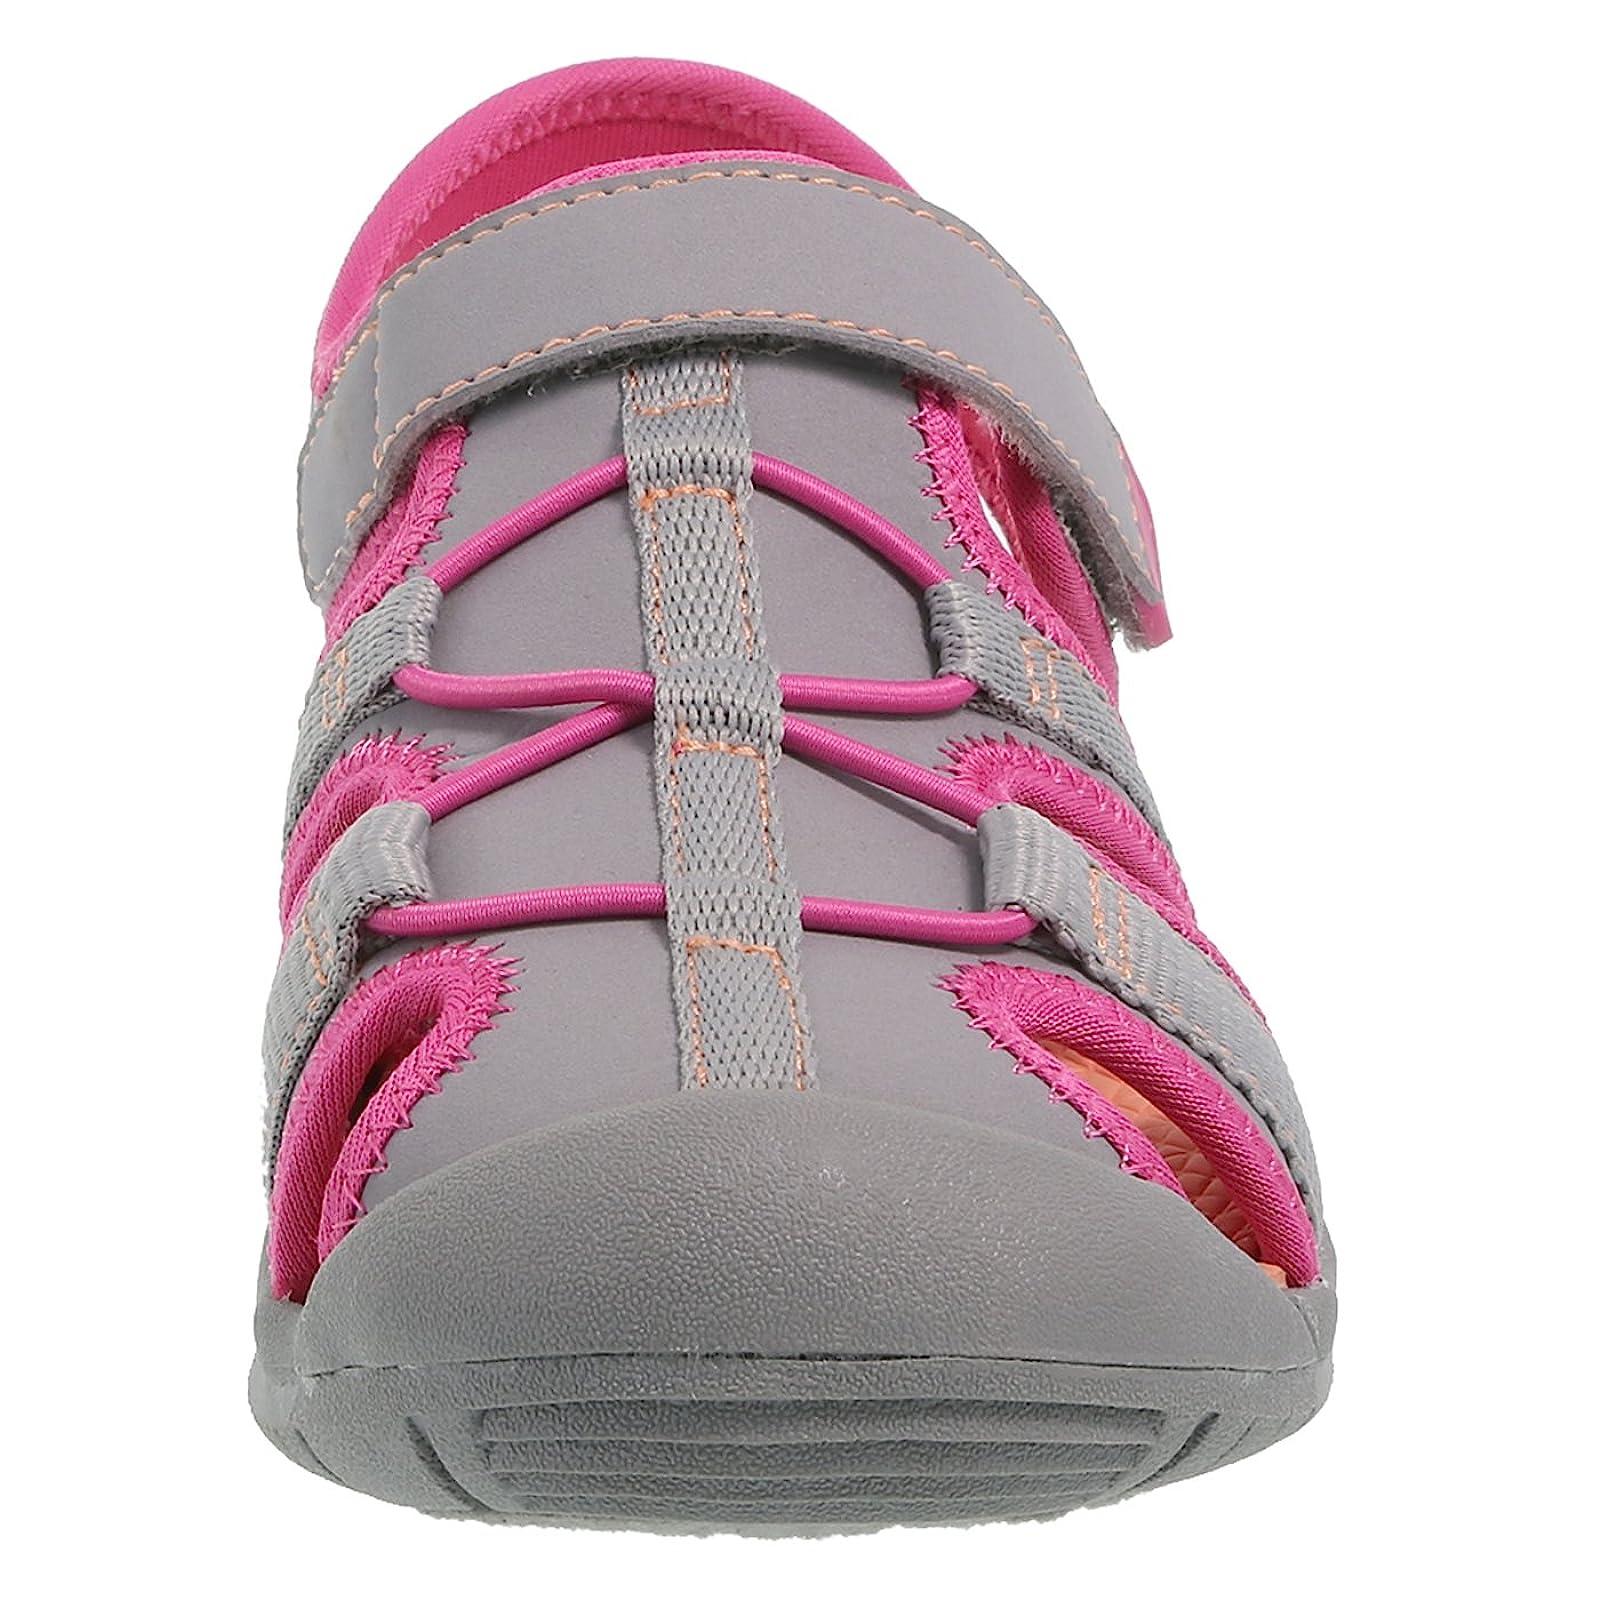 Rugged Outback Grey Pink Girls' Marina Bumptoe 175191040 - 3